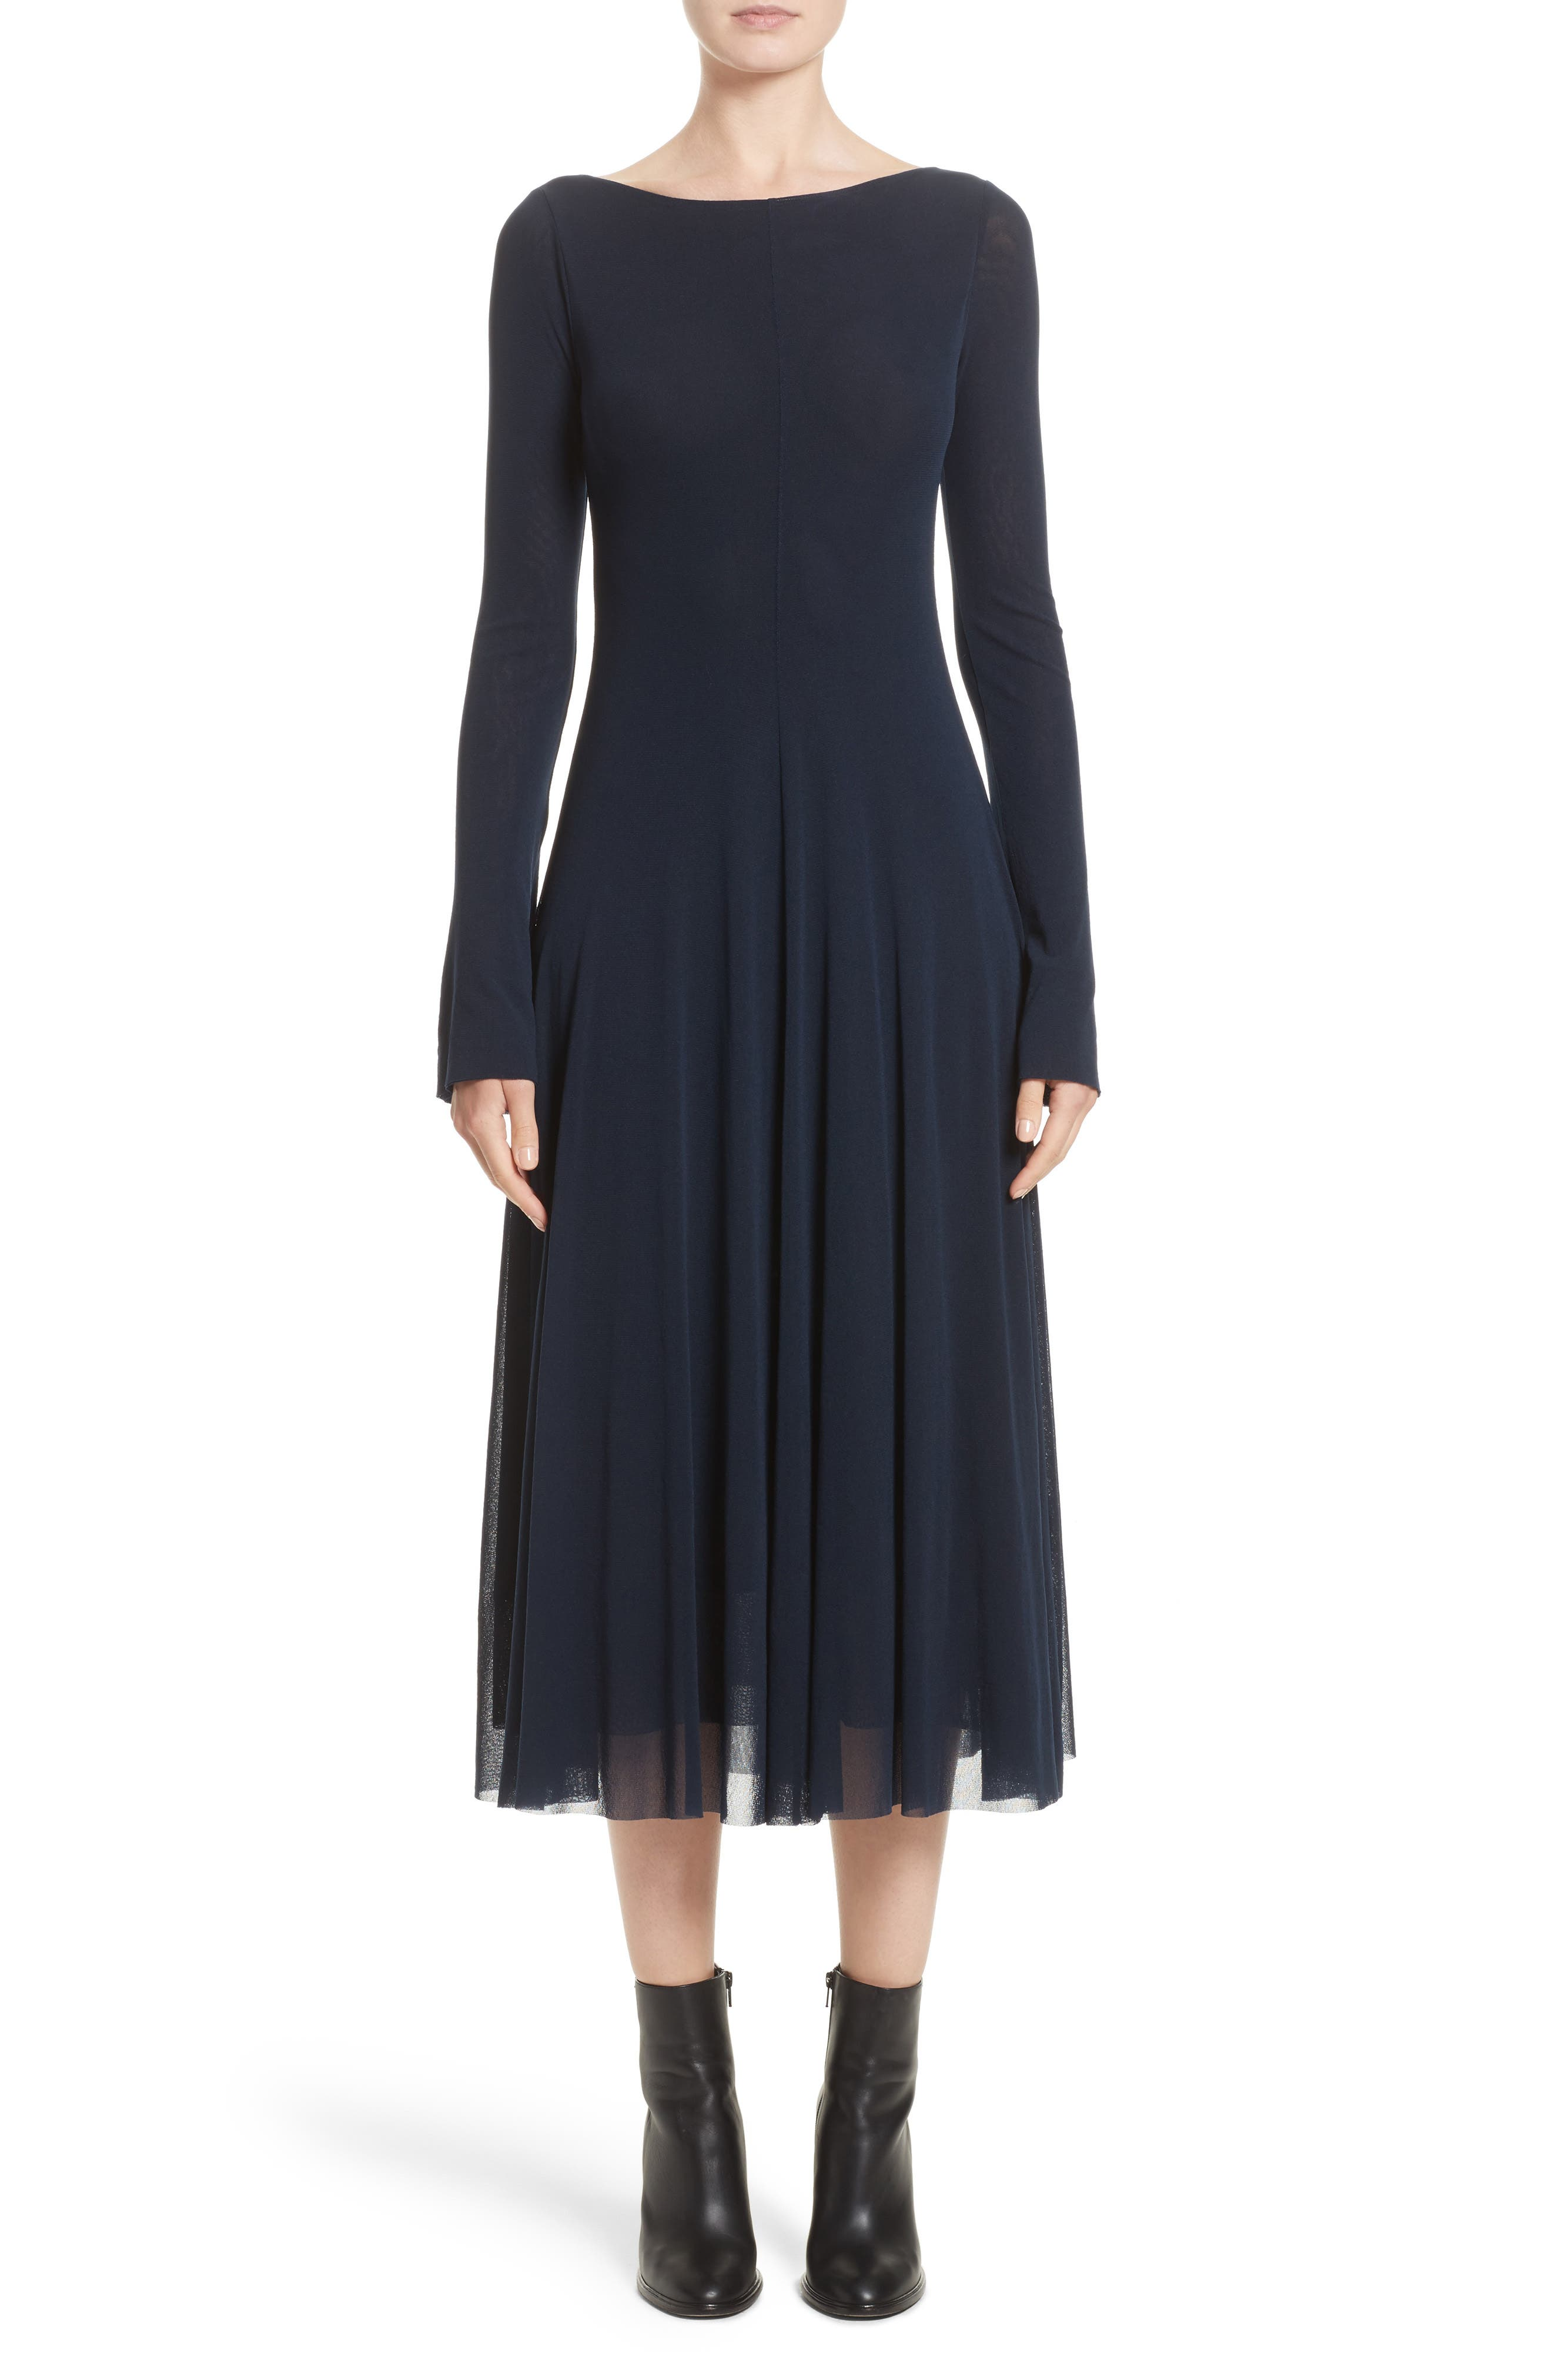 Fuzzi Reversible Tulle Dress